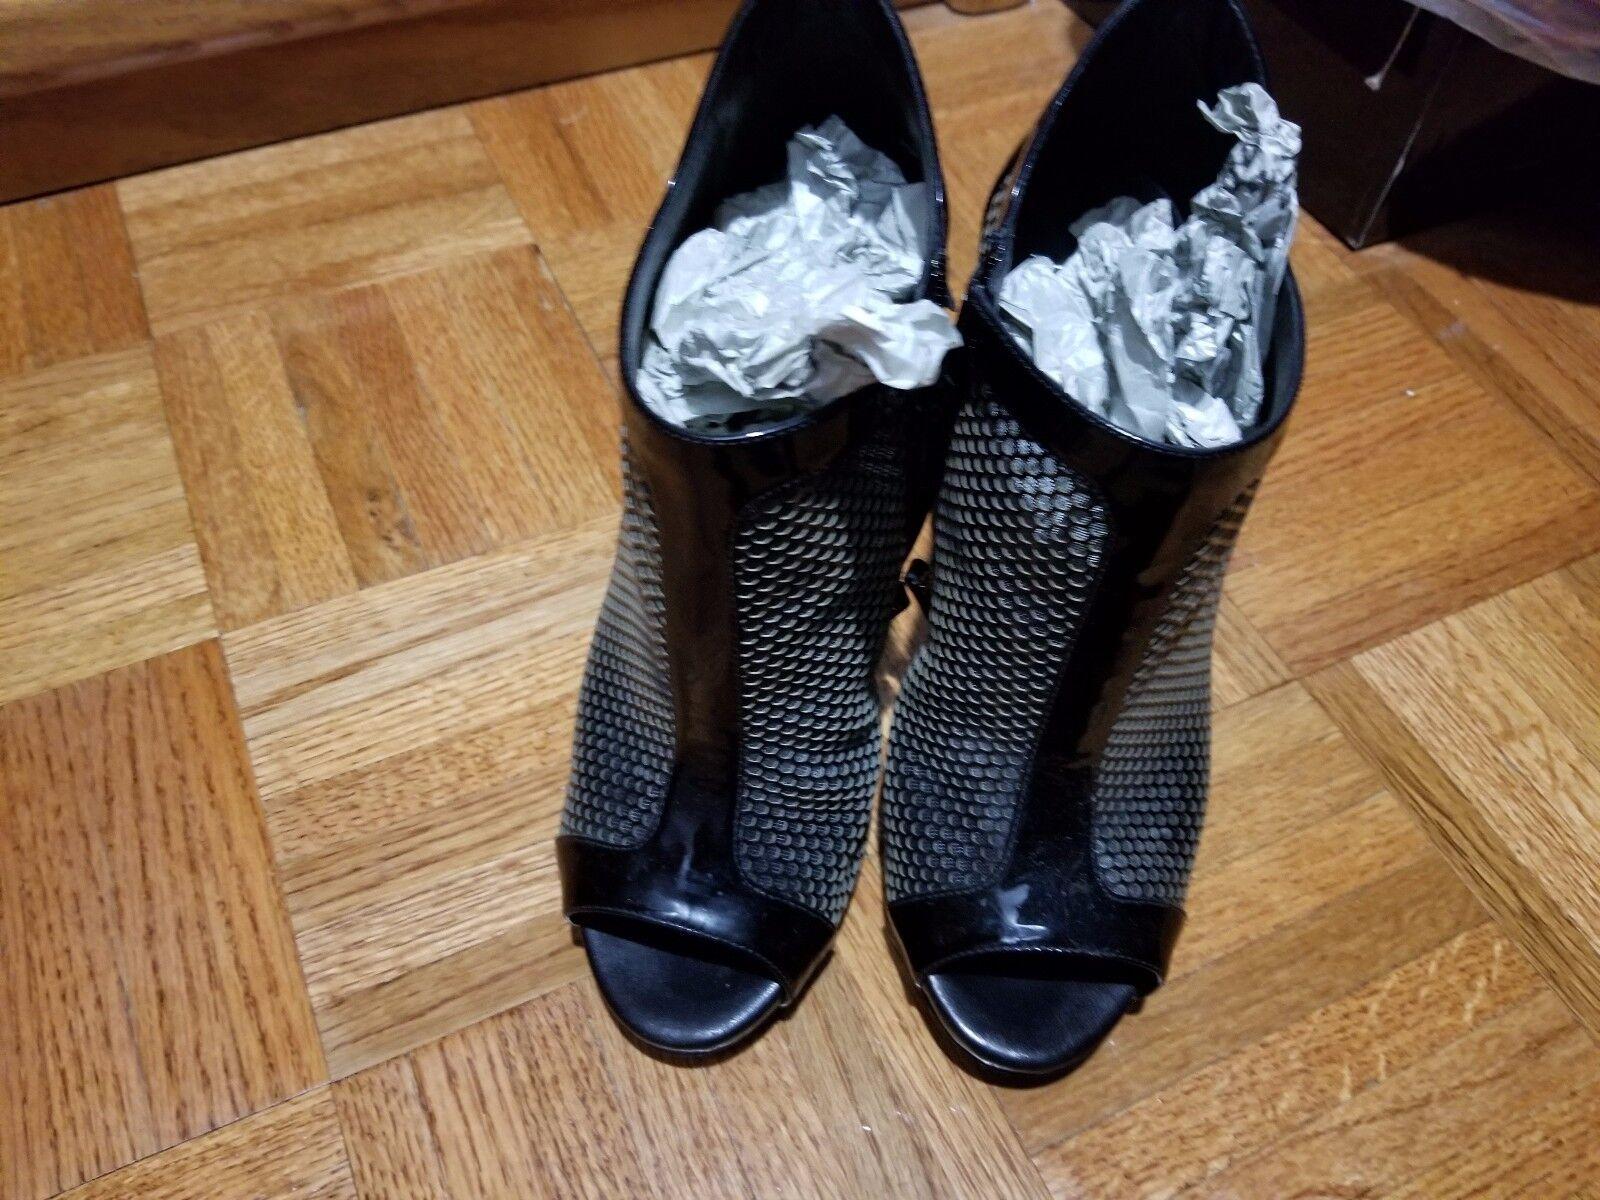 Giuseppe Zanotti booties mesh black black black patent high heels 39 ankle  boots 8b0265